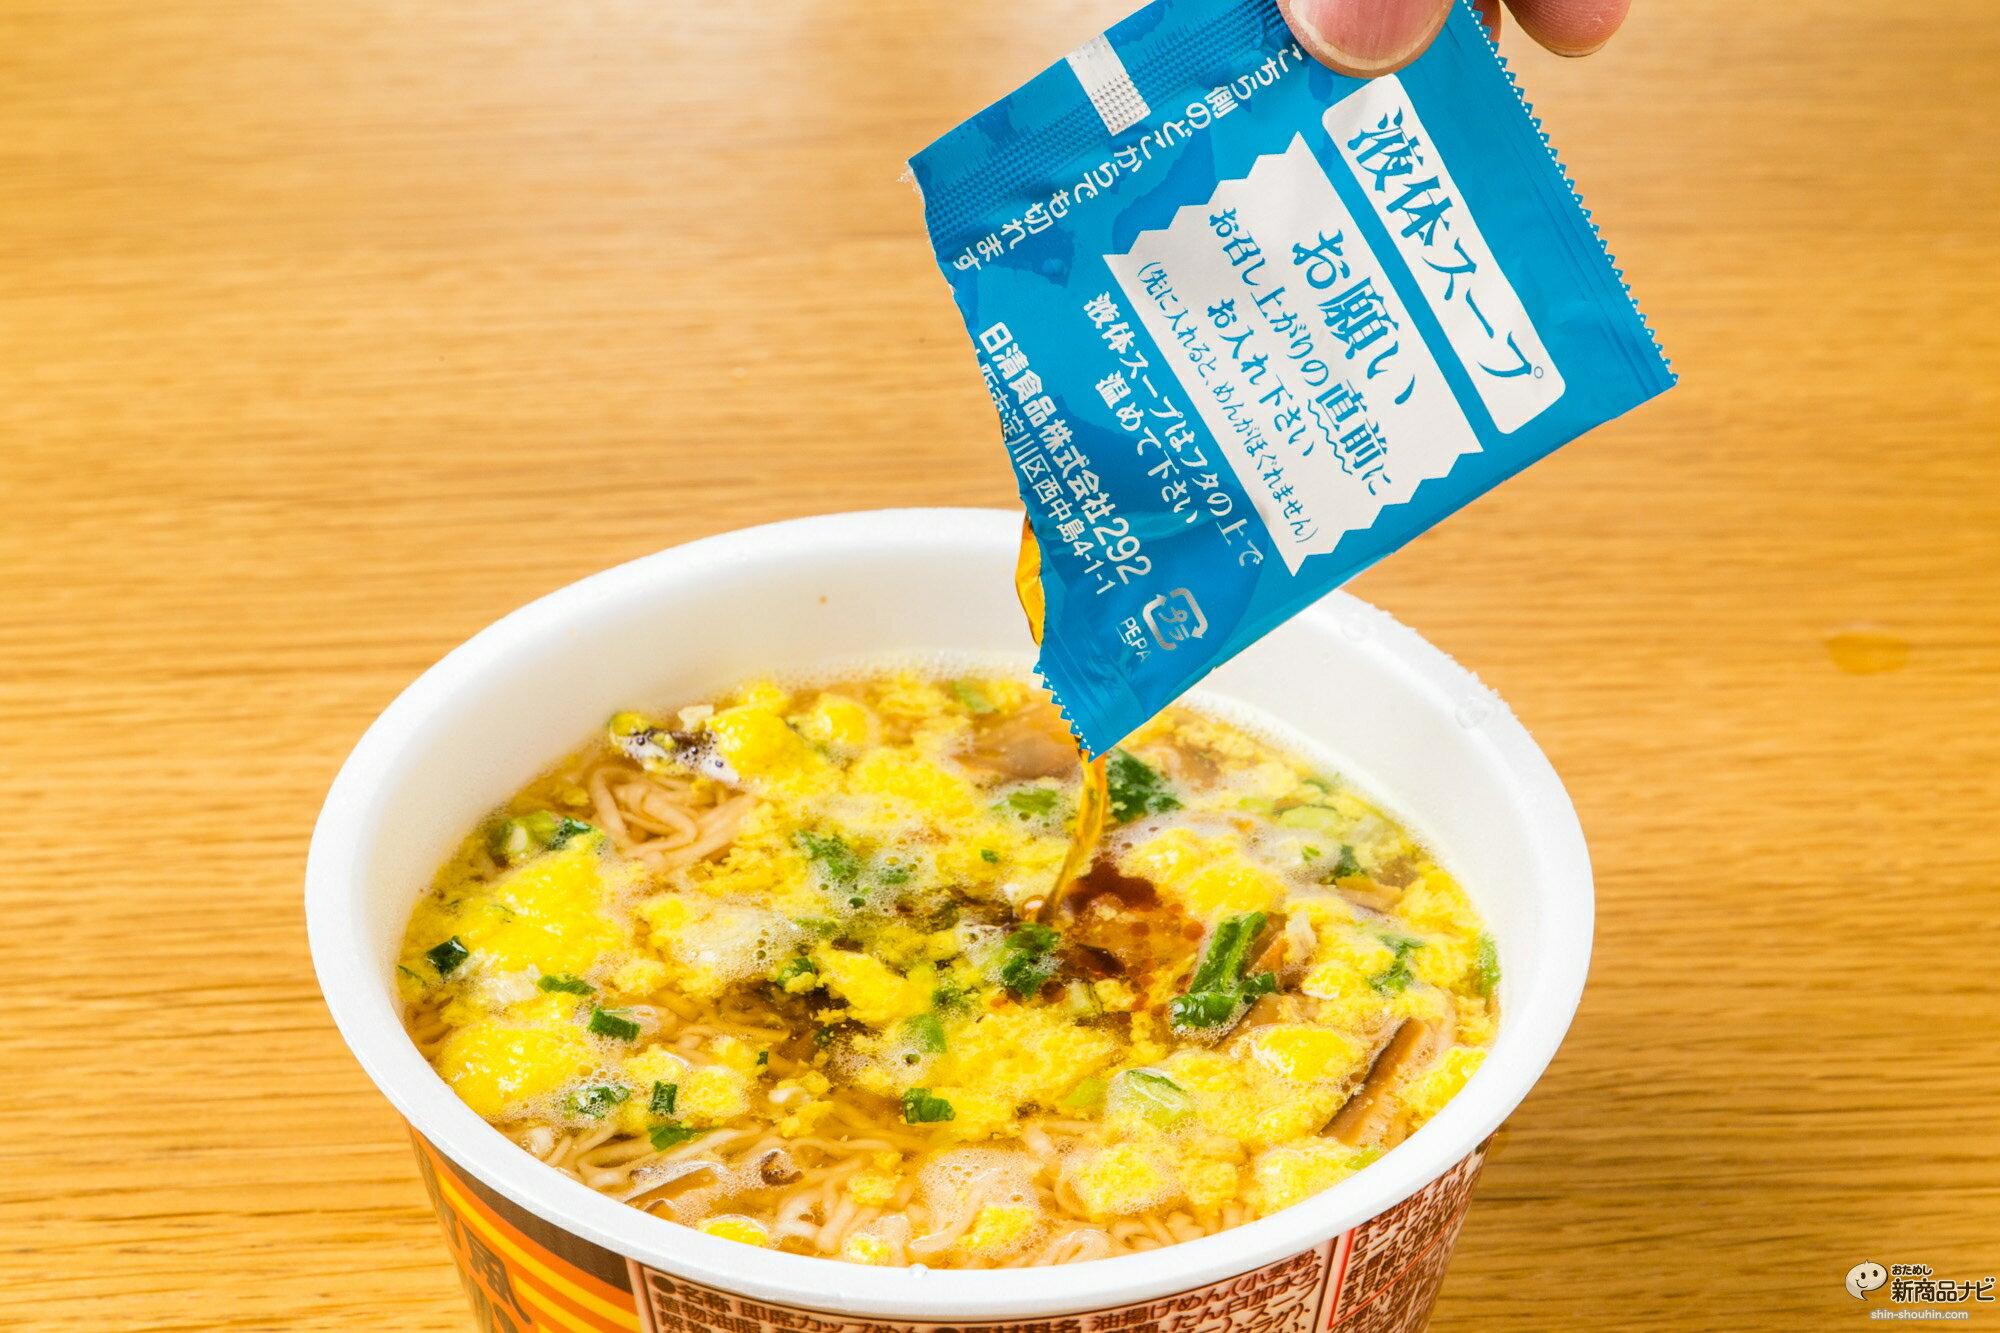 【Nissin日清】元祖小雞碗麵-雞蛋口味 85g 日本進口美食 3.18-4 / 7店休 暫停出貨 1